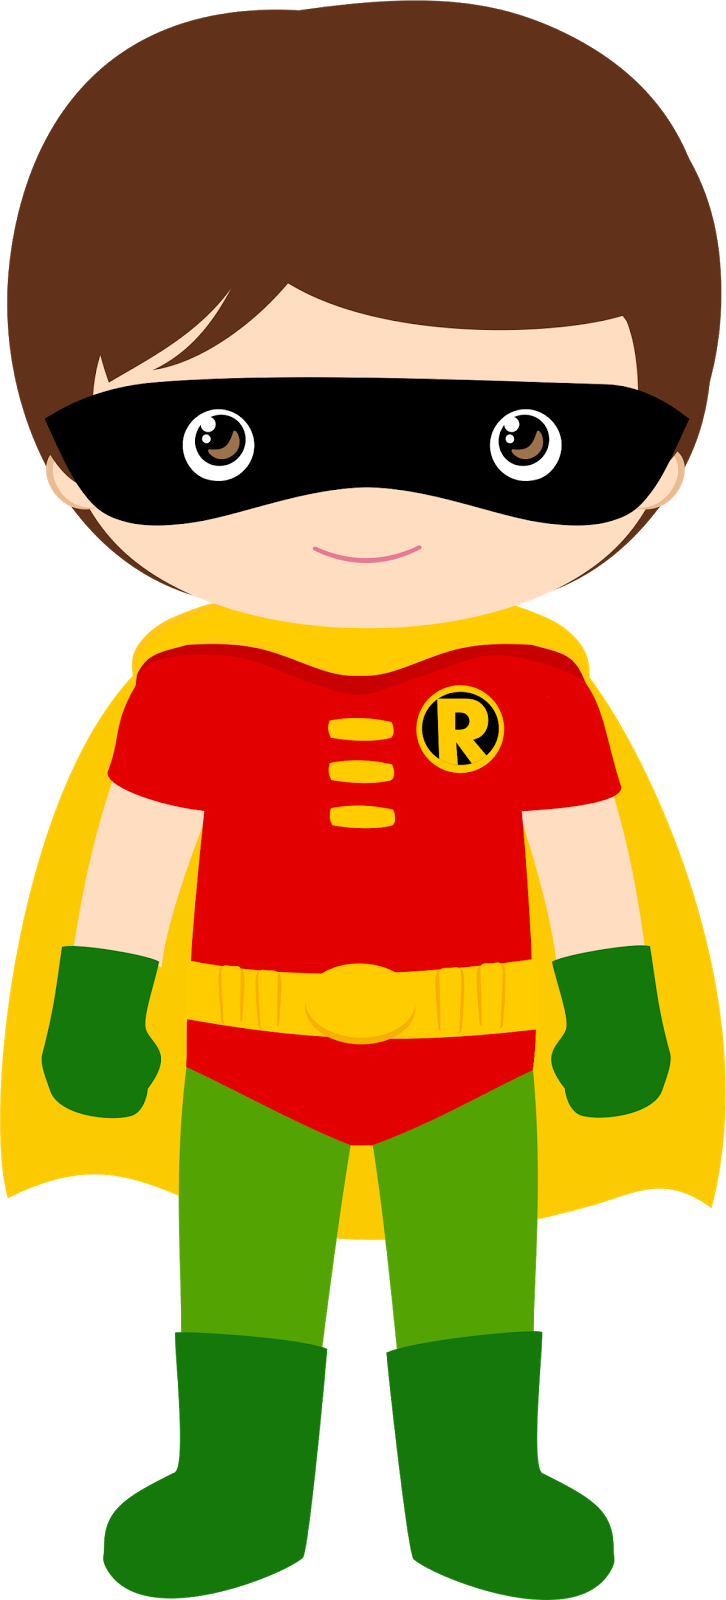 I tfjggb pwf png. Clipart homework superhero